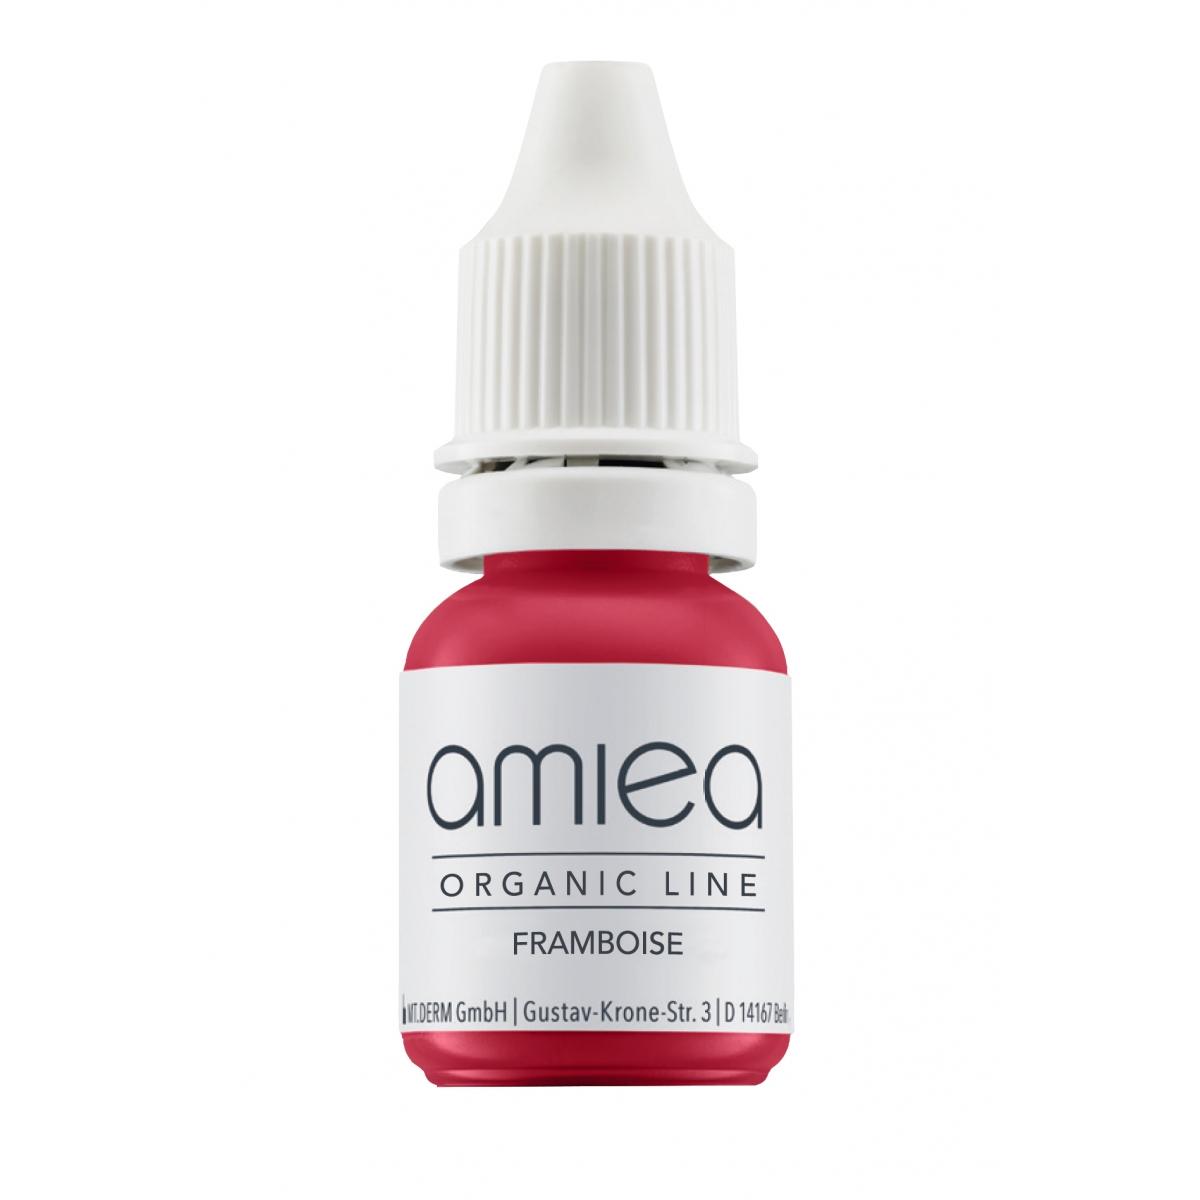 ORGANIC LINE (10ml) - PIGMENT FRAMBOISE ORGANICLINE AMIEA (10 ml)